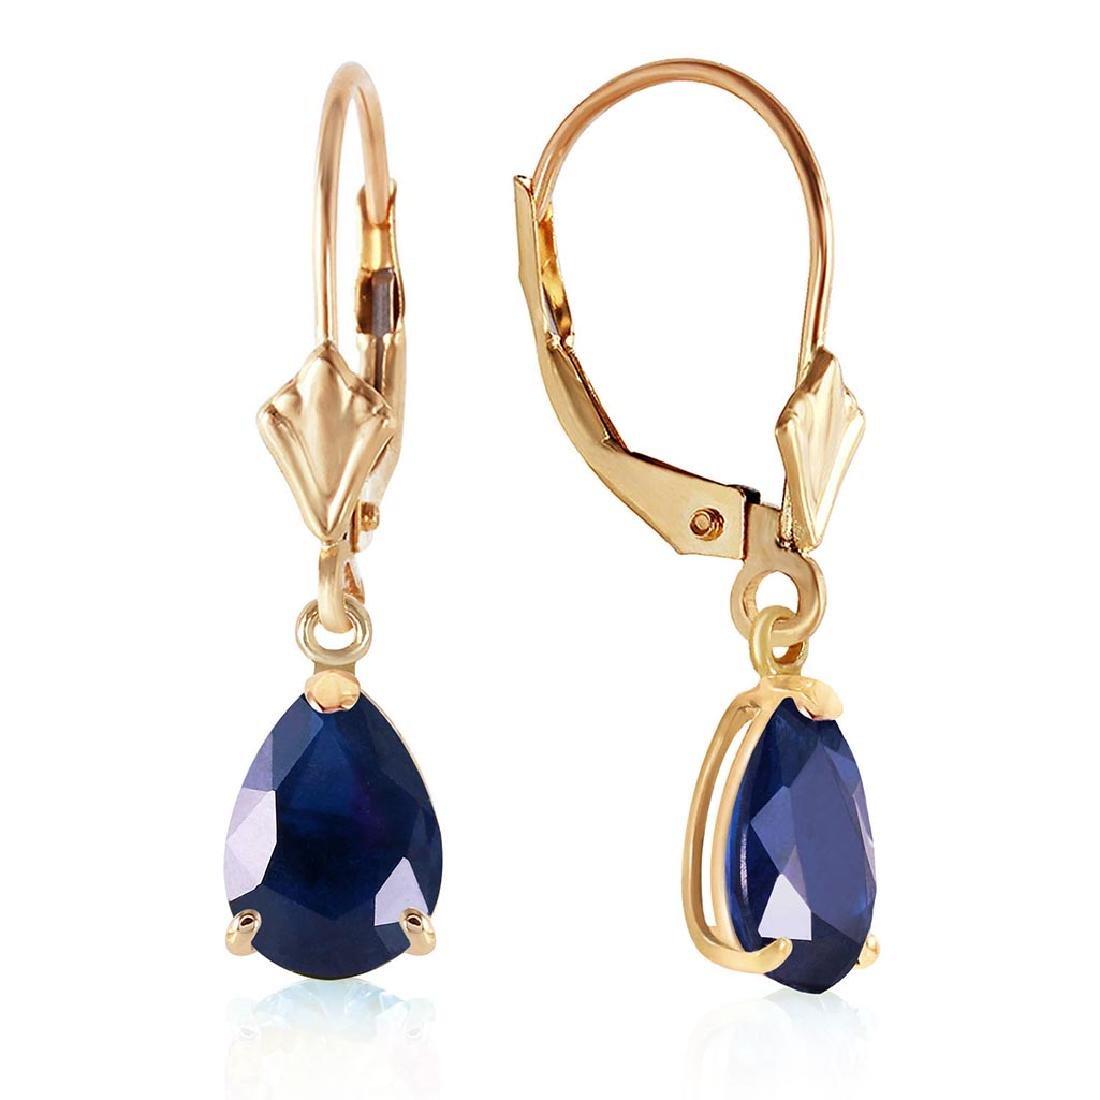 3 Carat 14K Solid Gold Leverback Earrings Sapphire